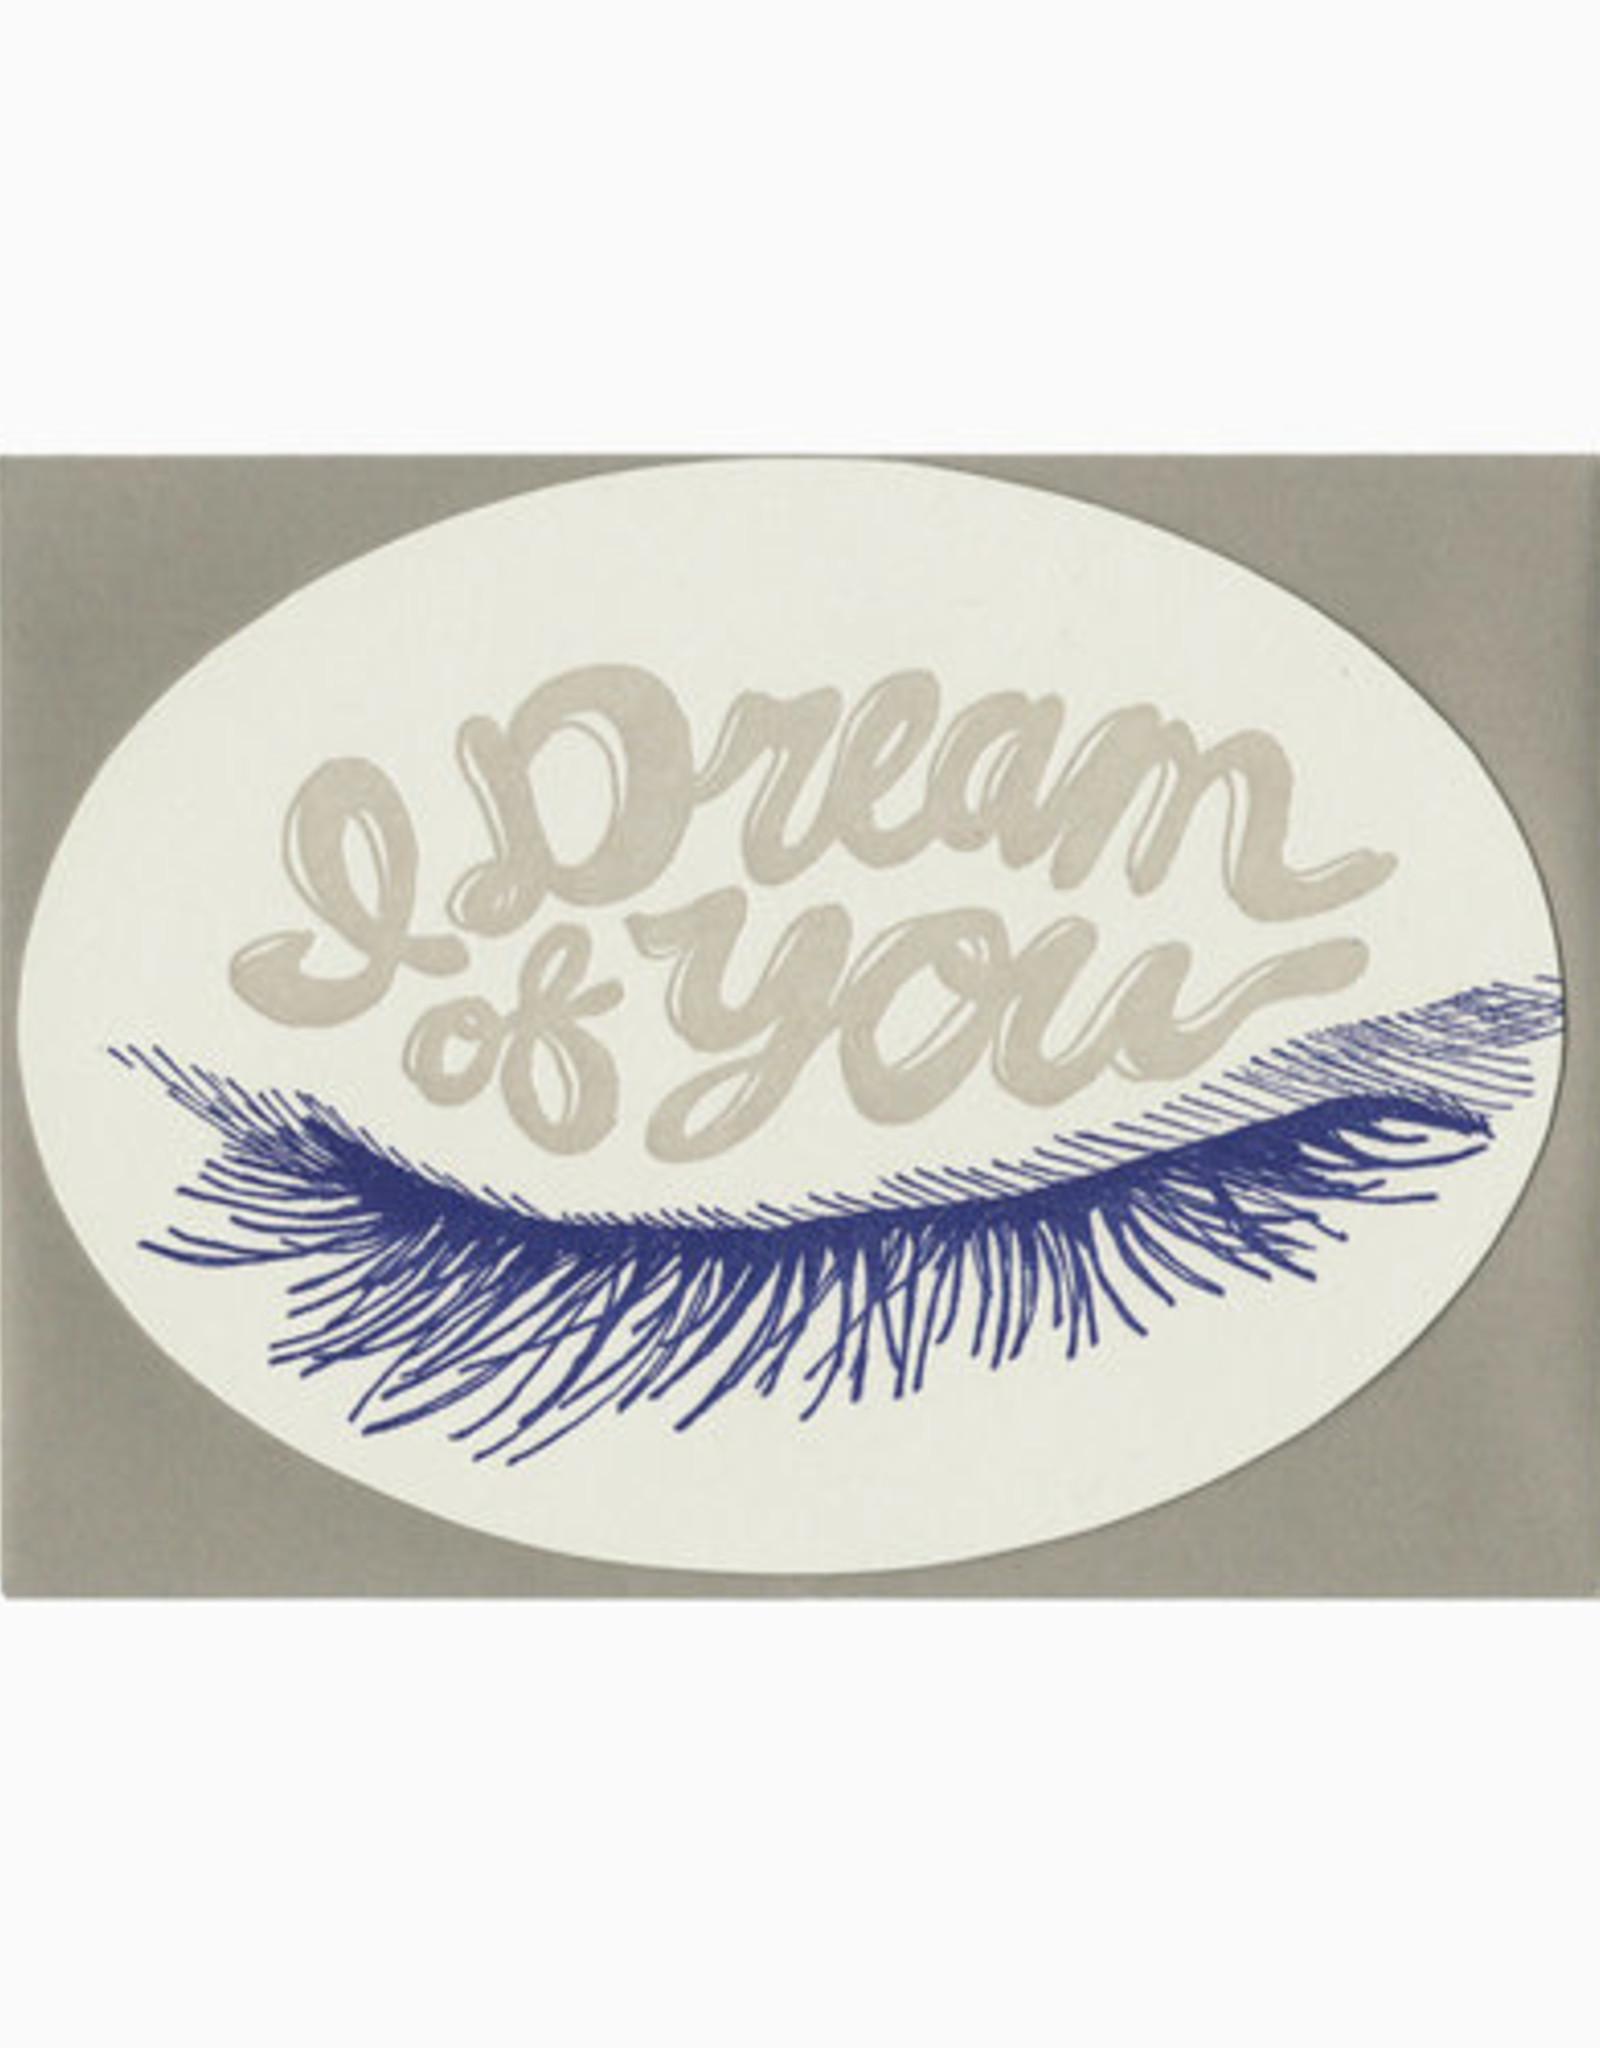 Blackbird Letterpress I Dream Of You Greeting Card